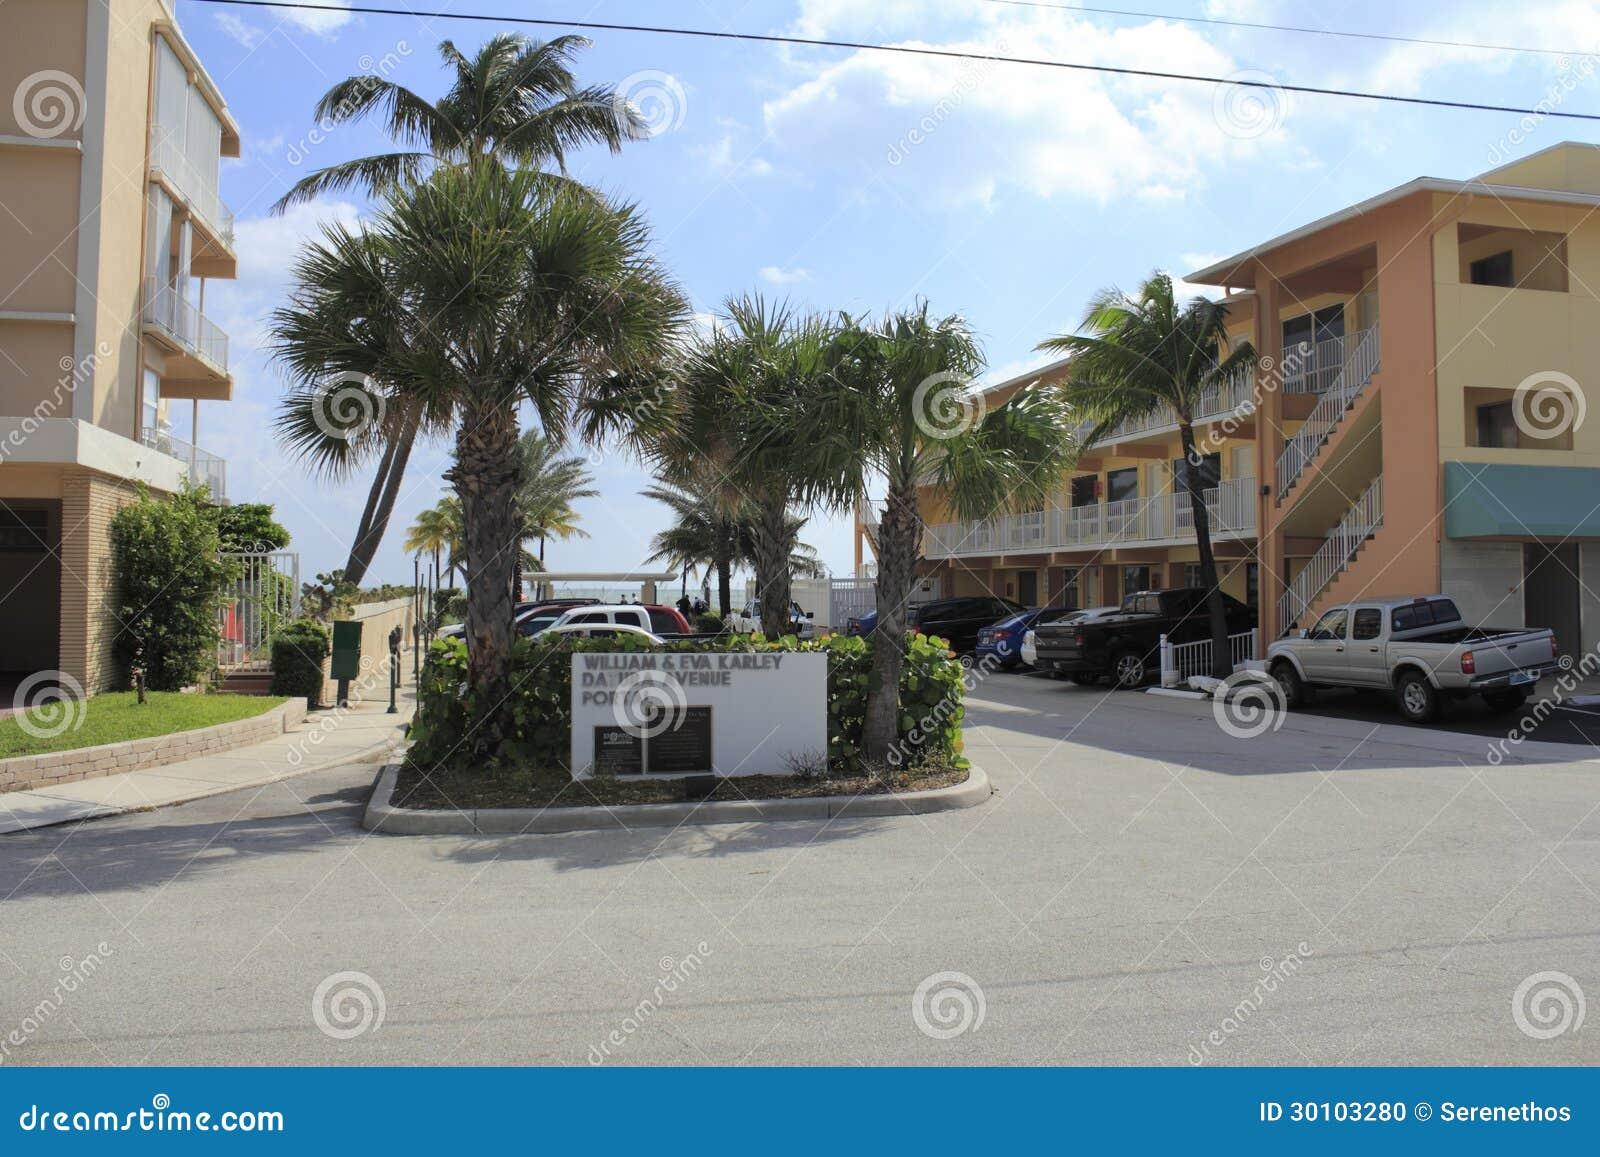 datura avenue portal lauderdale by the sea florida. Black Bedroom Furniture Sets. Home Design Ideas